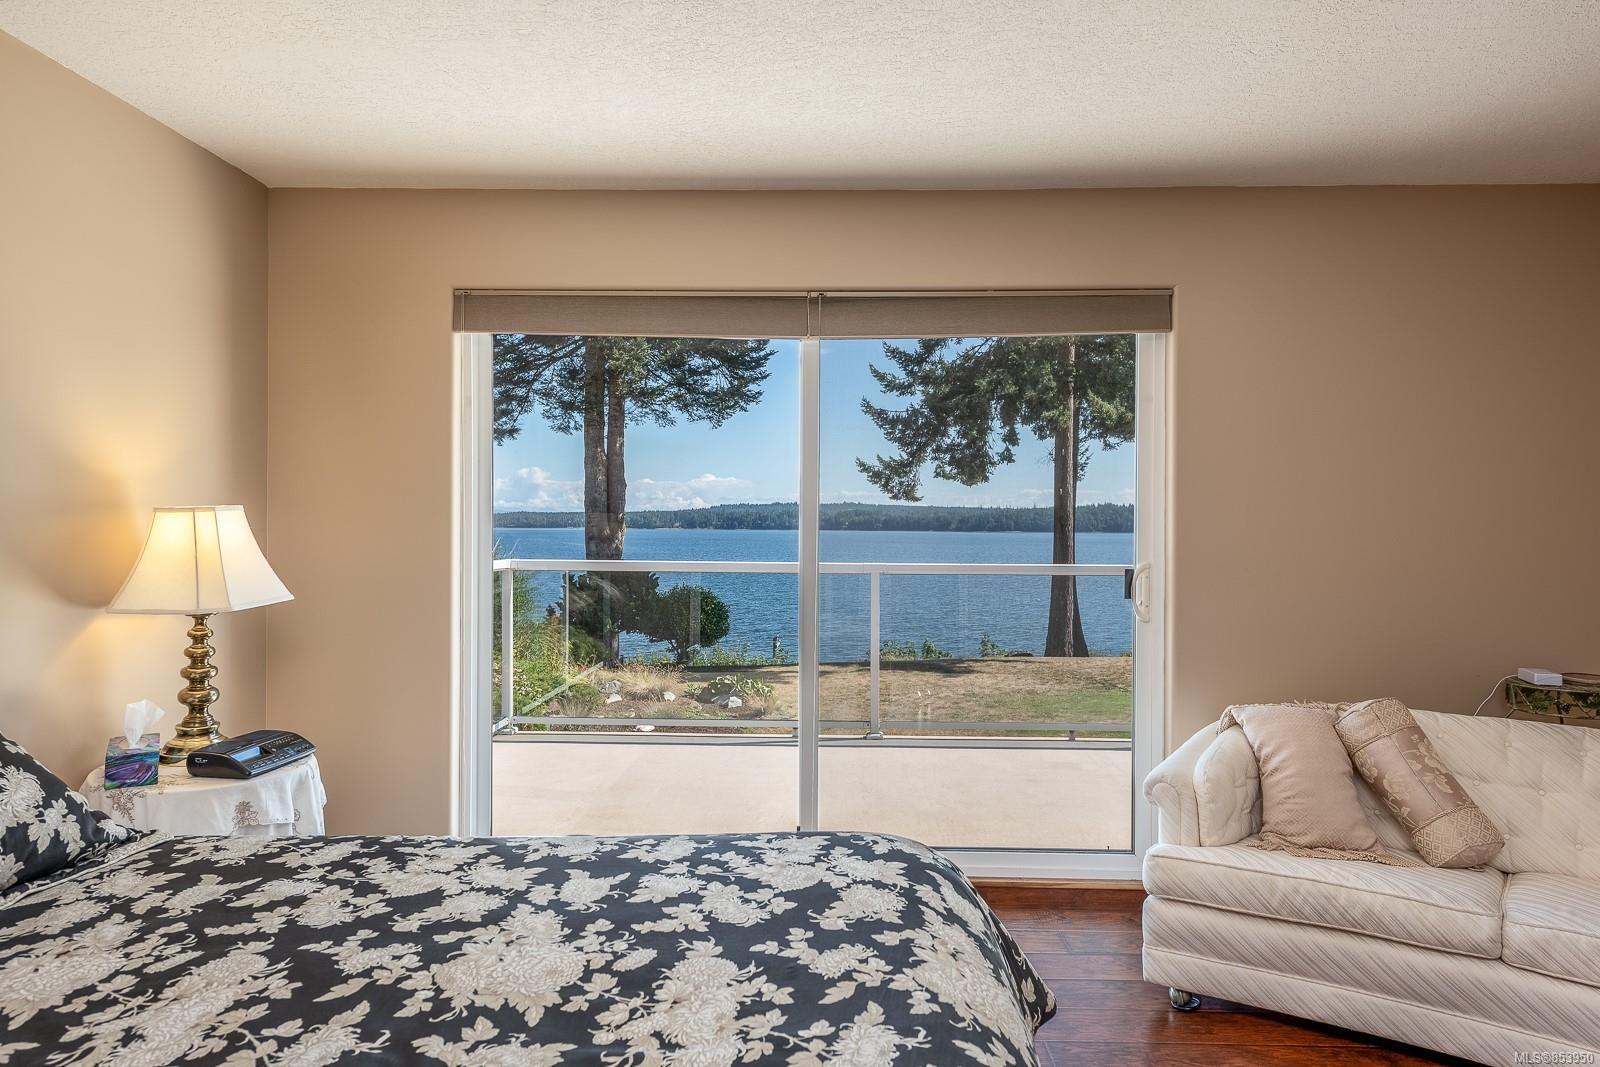 Photo 8: Photos: 5880 GARVIN Rd in : CV Union Bay/Fanny Bay House for sale (Comox Valley)  : MLS®# 853950